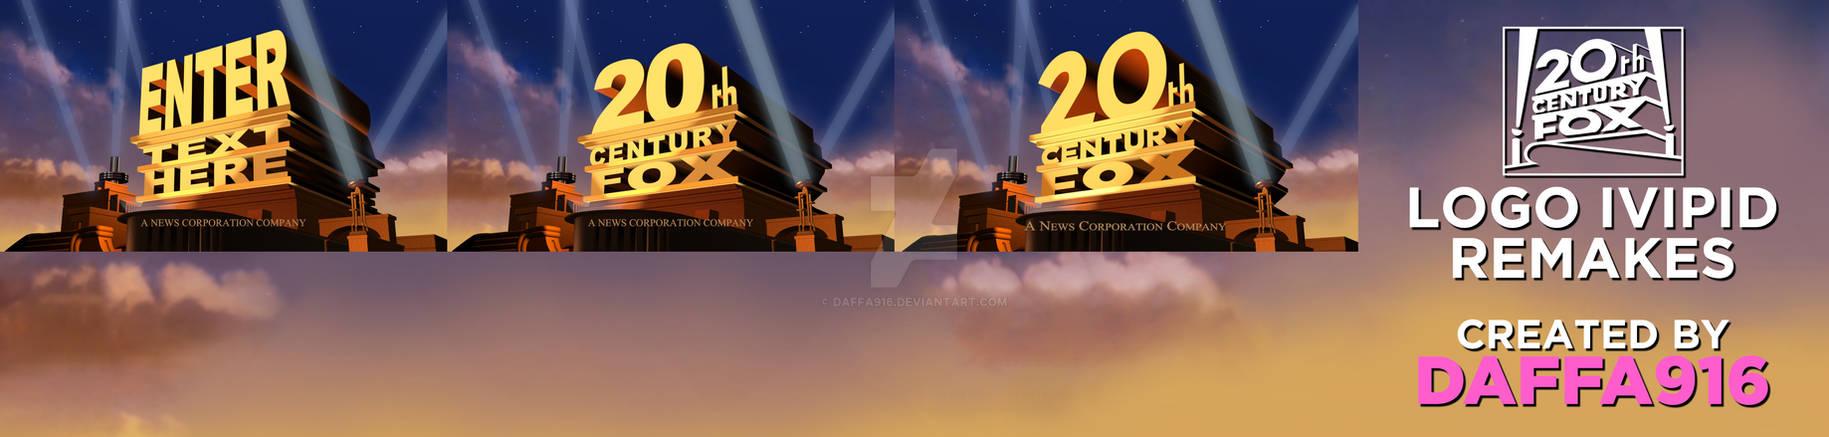 20th Century Fox 1994 Roblox Remake With R Symbol Youtube Nongohm2019 Professional Digital Artist Deviantart